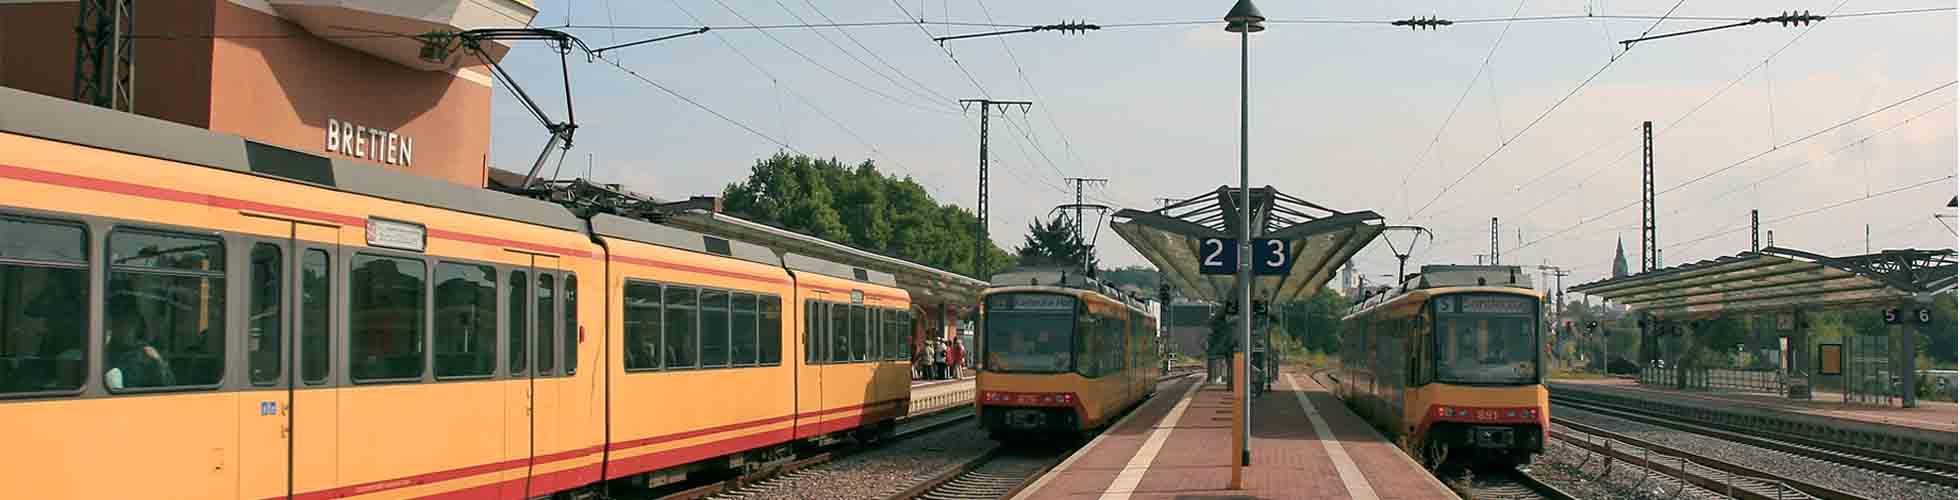 Bahnhof Bretten